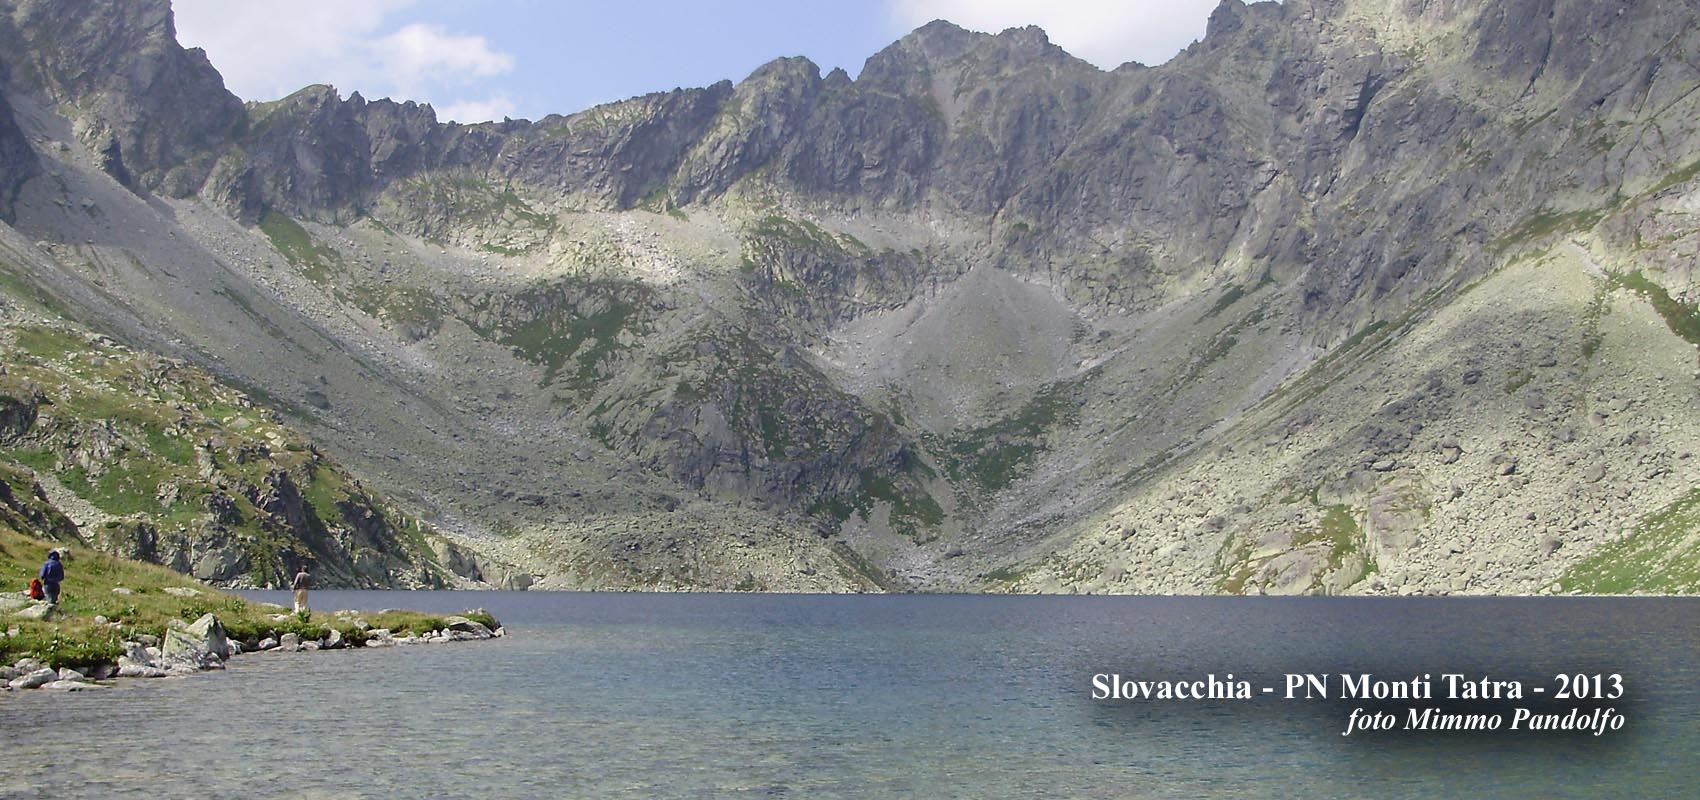 Slovakia, PN Monti Tatra - Velké Hinkovo pleso - 2013